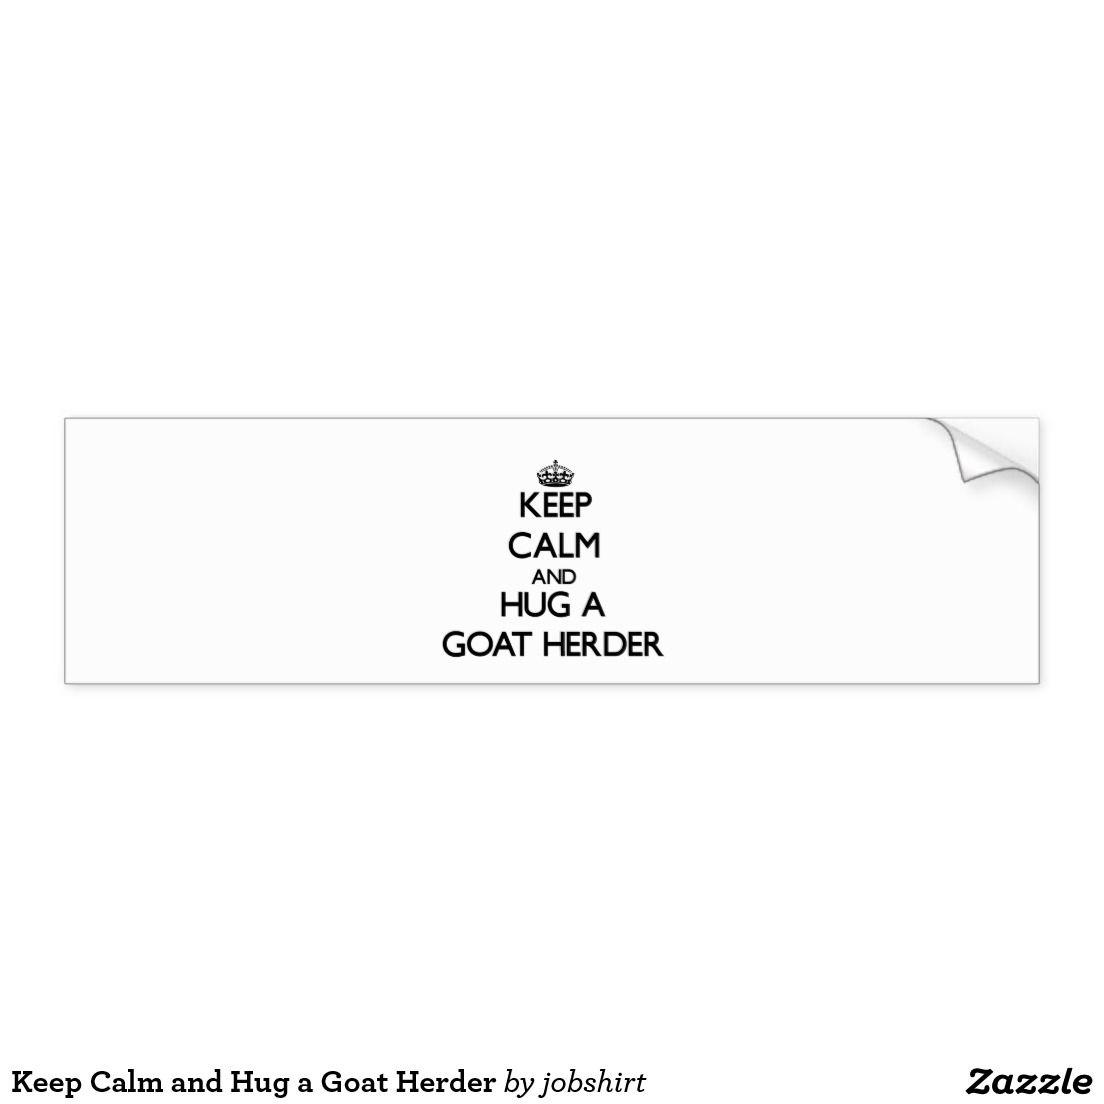 Keep Calm And Hug A Goat Herder Bumper Sticker Zazzle Com Bumper Stickers Keep Calm And Love Car Bumper Stickers [ 1104 x 1104 Pixel ]